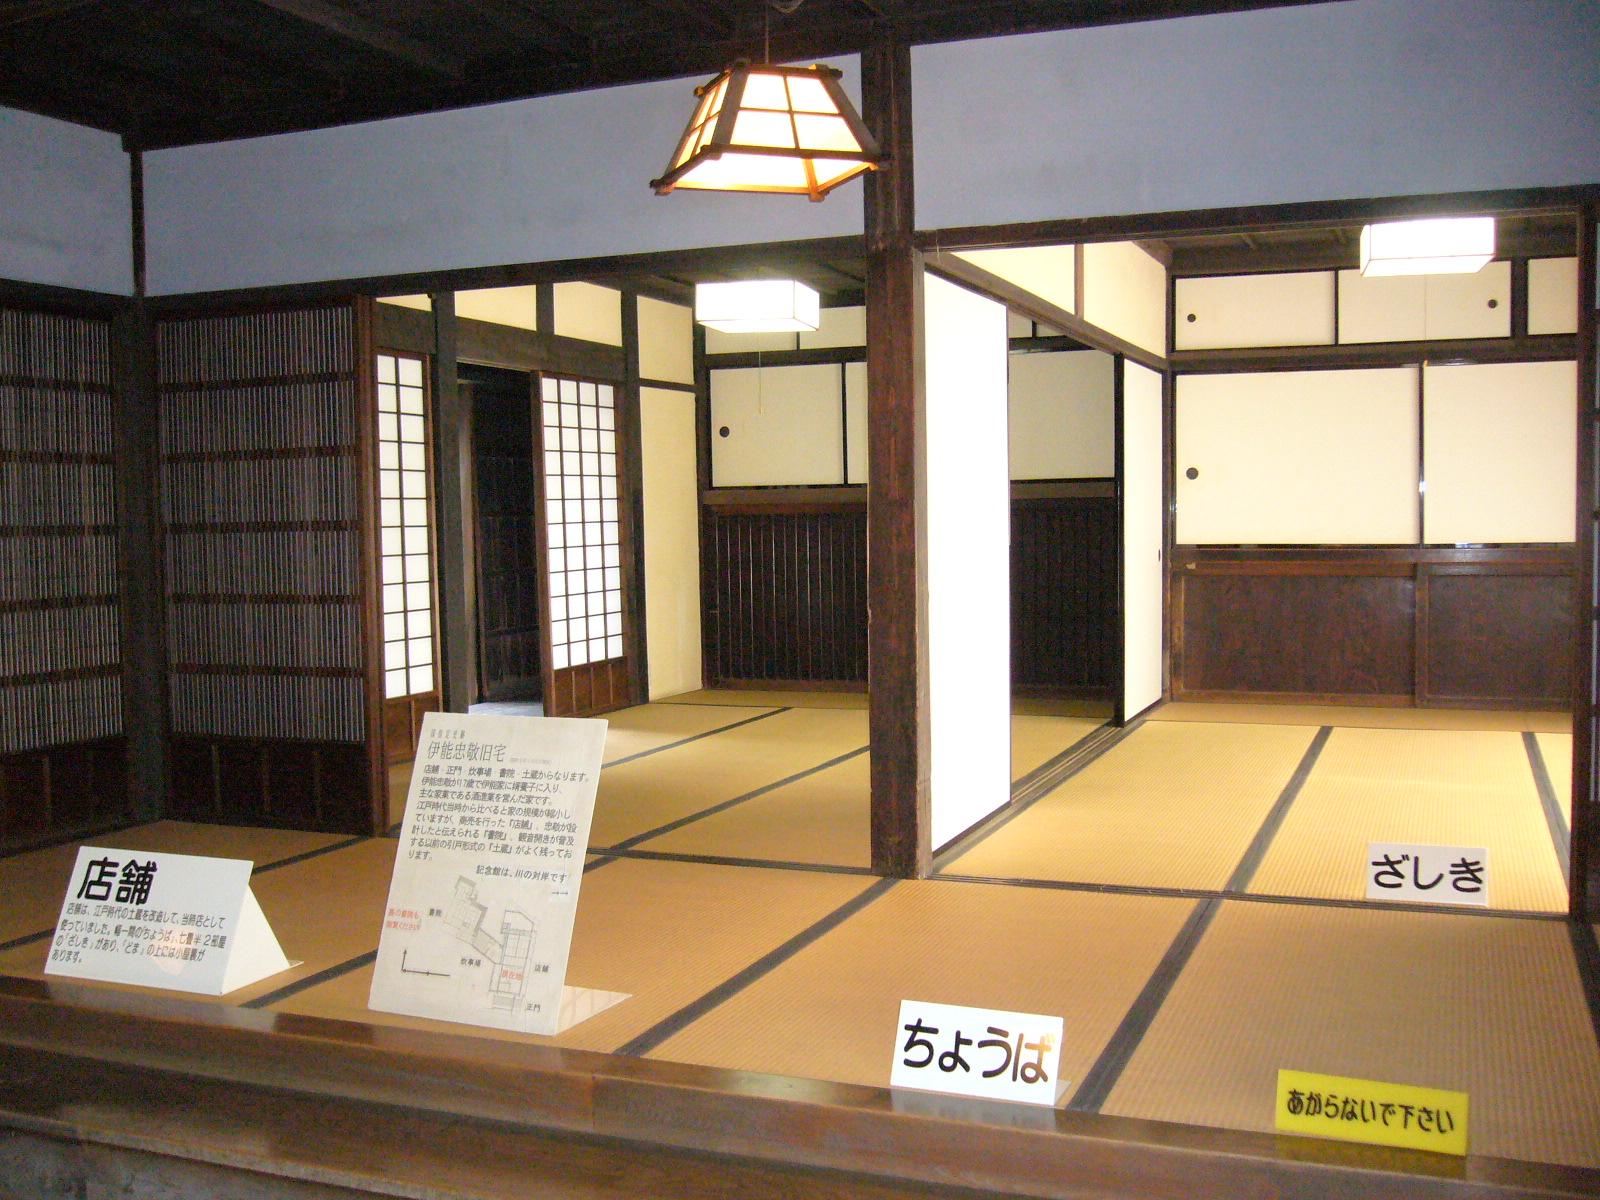 ino-tadataka-house-misekatori-cityjapan